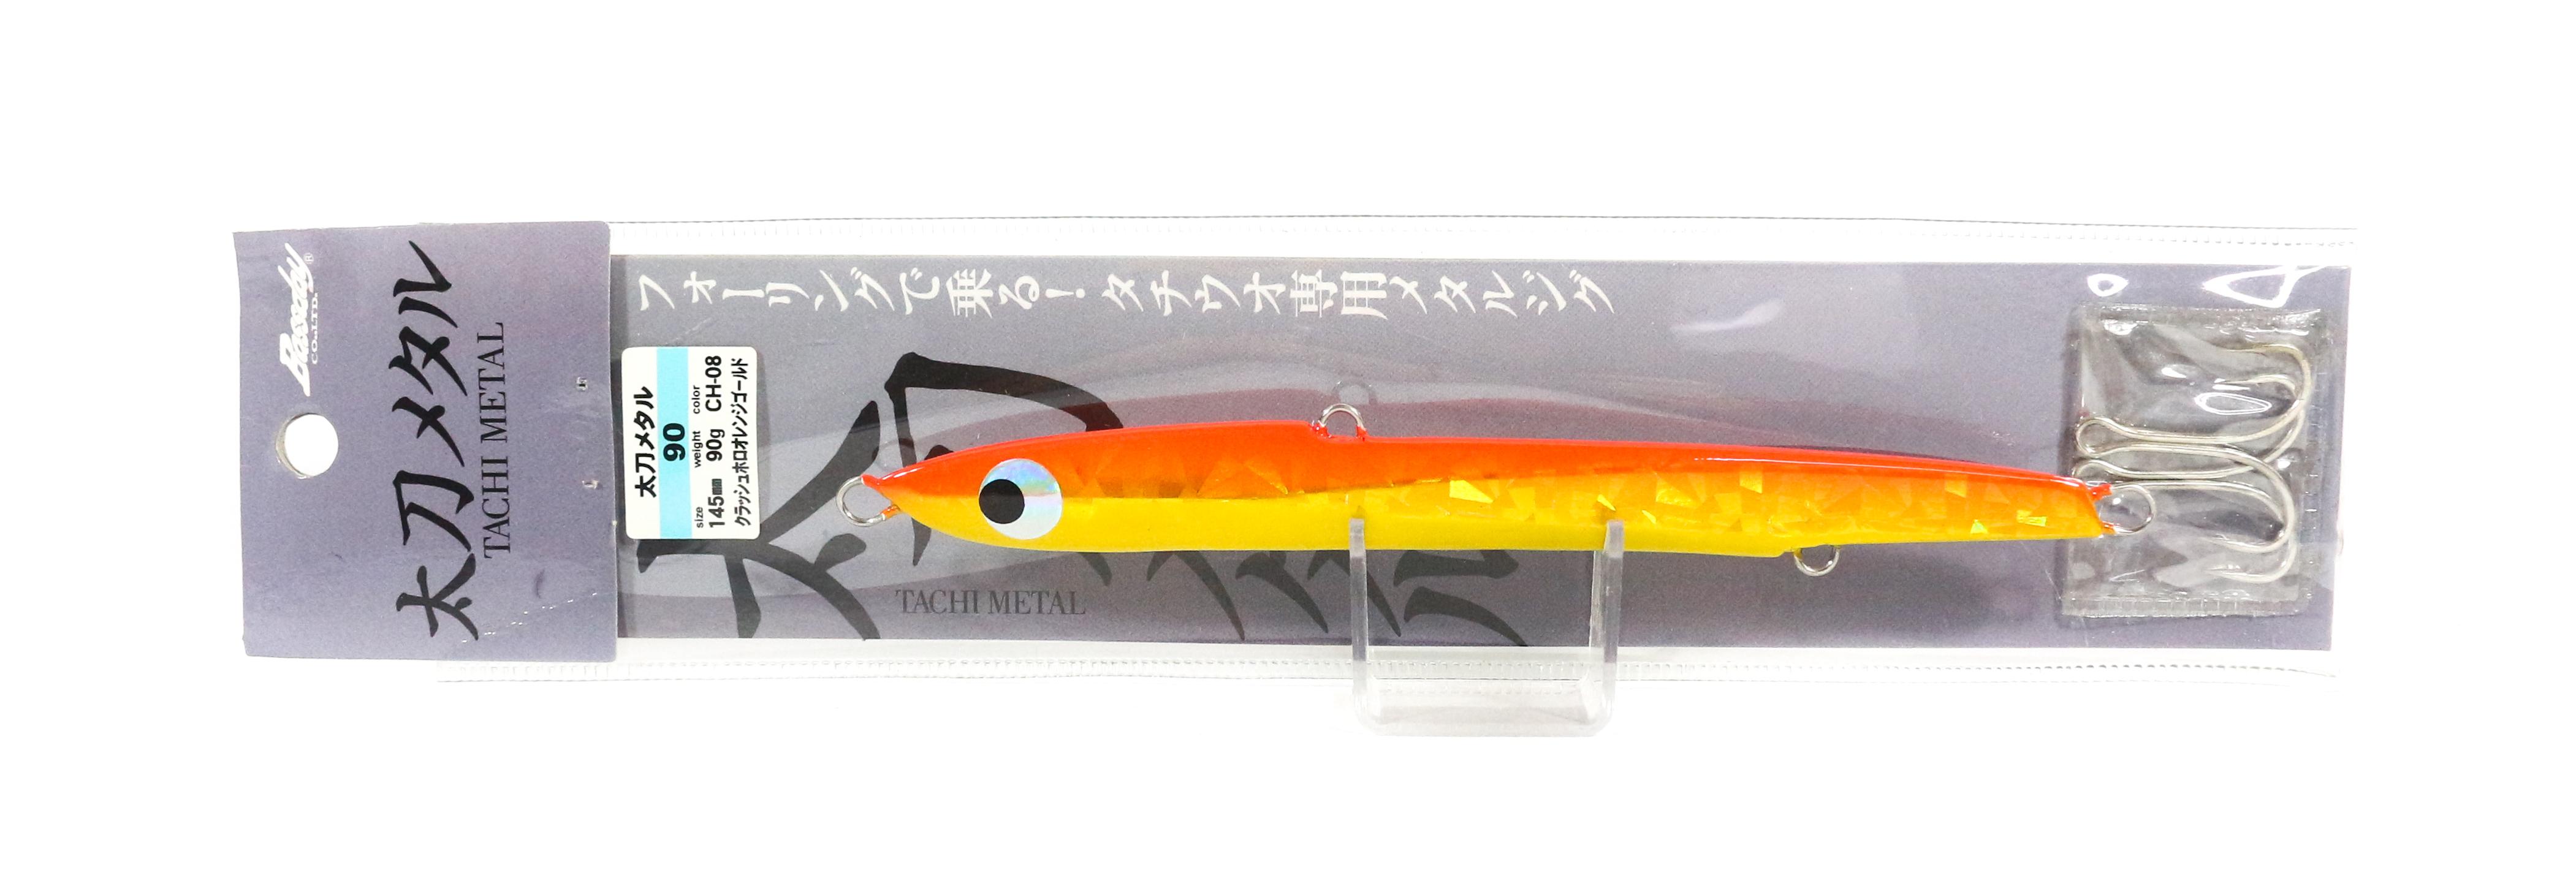 Sale Bassday Metal Jig Tachi Metal 90 grams CH-08 (2072)